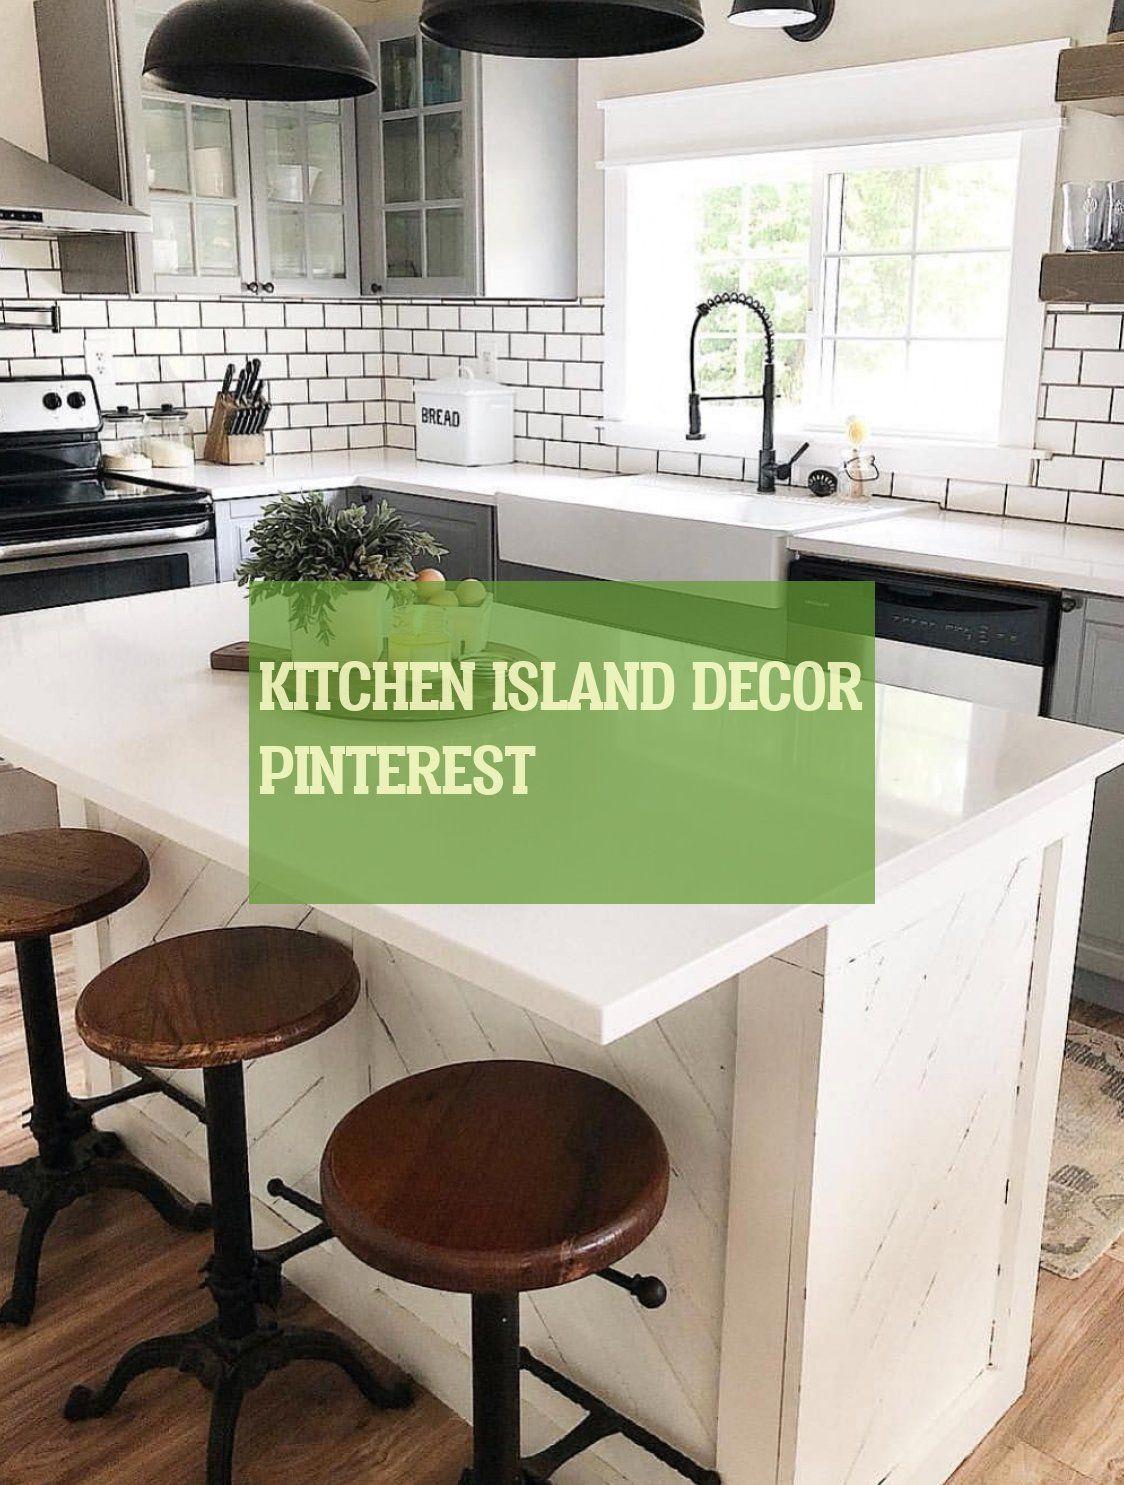 Kitchen Island Decor Pinterest Kitchen Island Decor Island Decor Kitchen Counter Decor